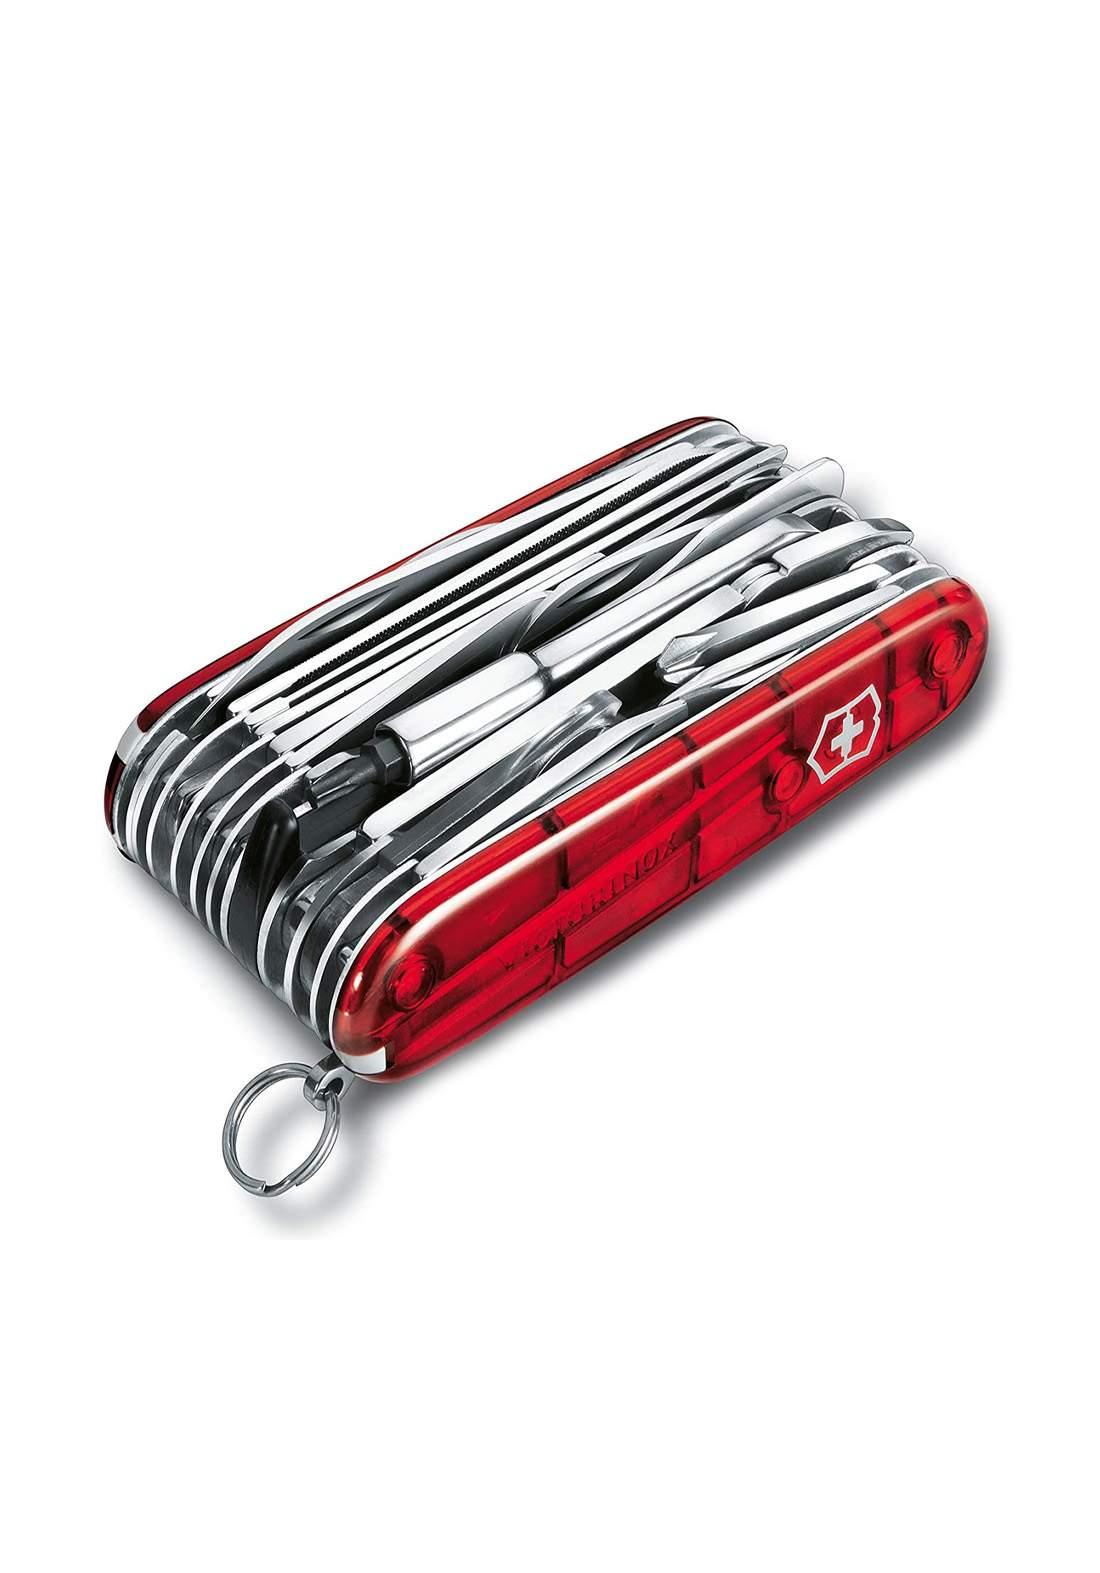 Victorinox 16795xlt Pocket Knife سكين جيب بلون احمر